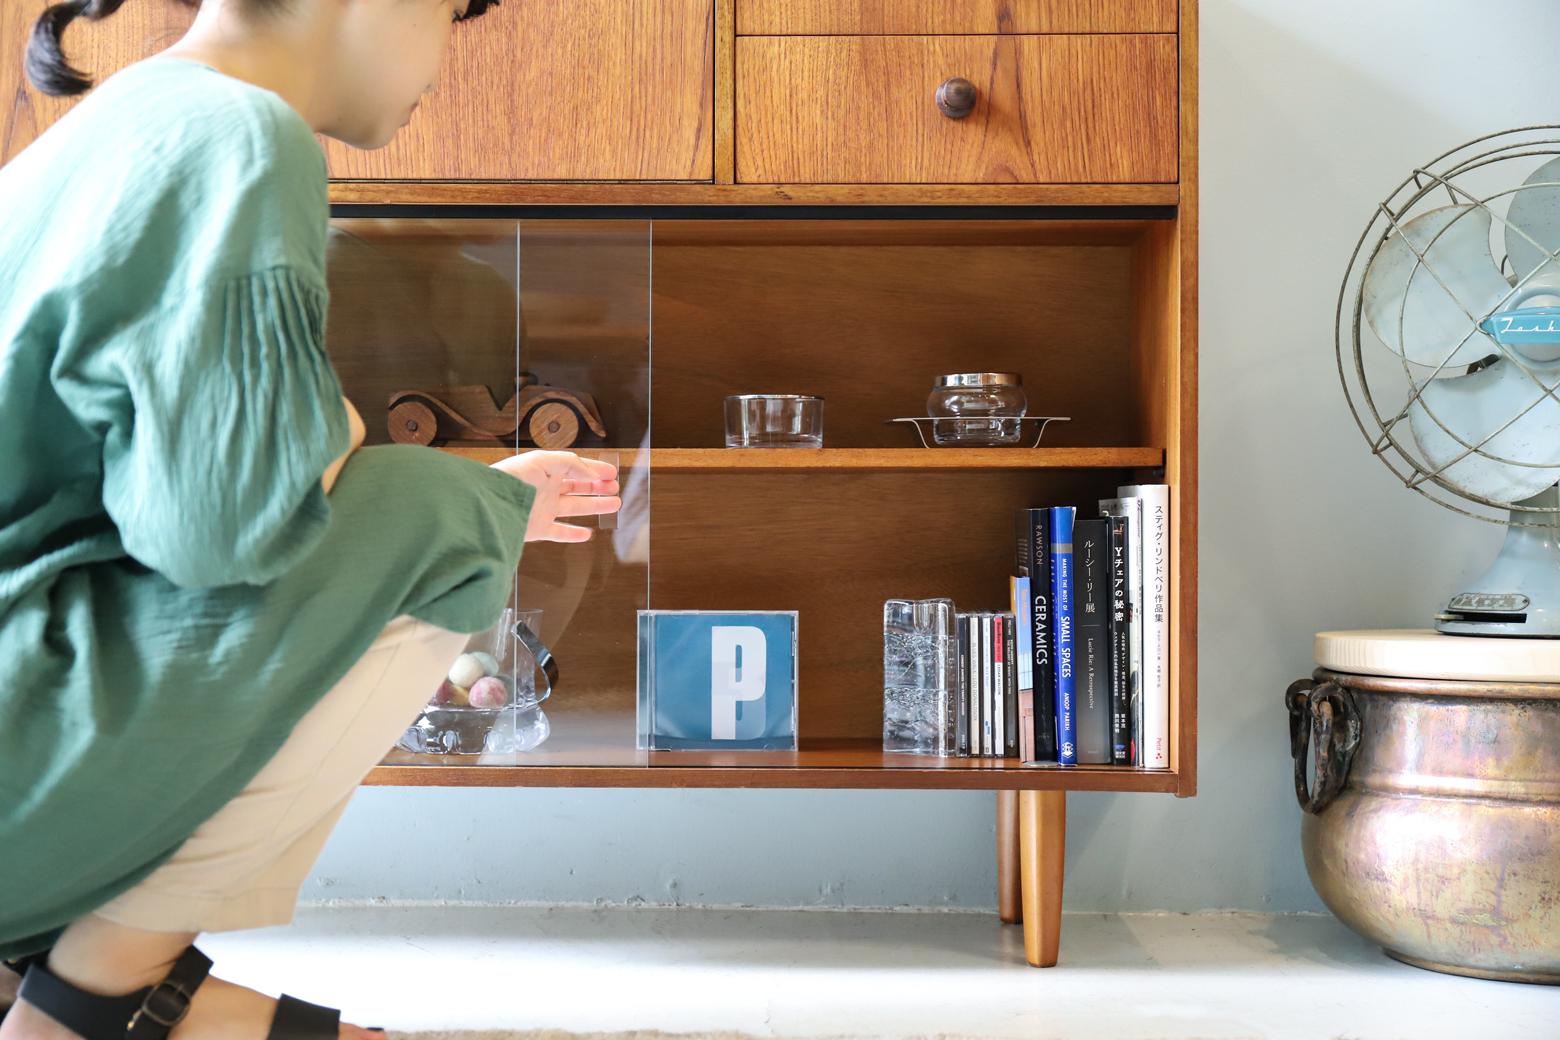 UK Vintage Avalon Yatton Drink Cabinet/イギリス ヴィンテージ アバロンヤットン ドリンク キャビネット